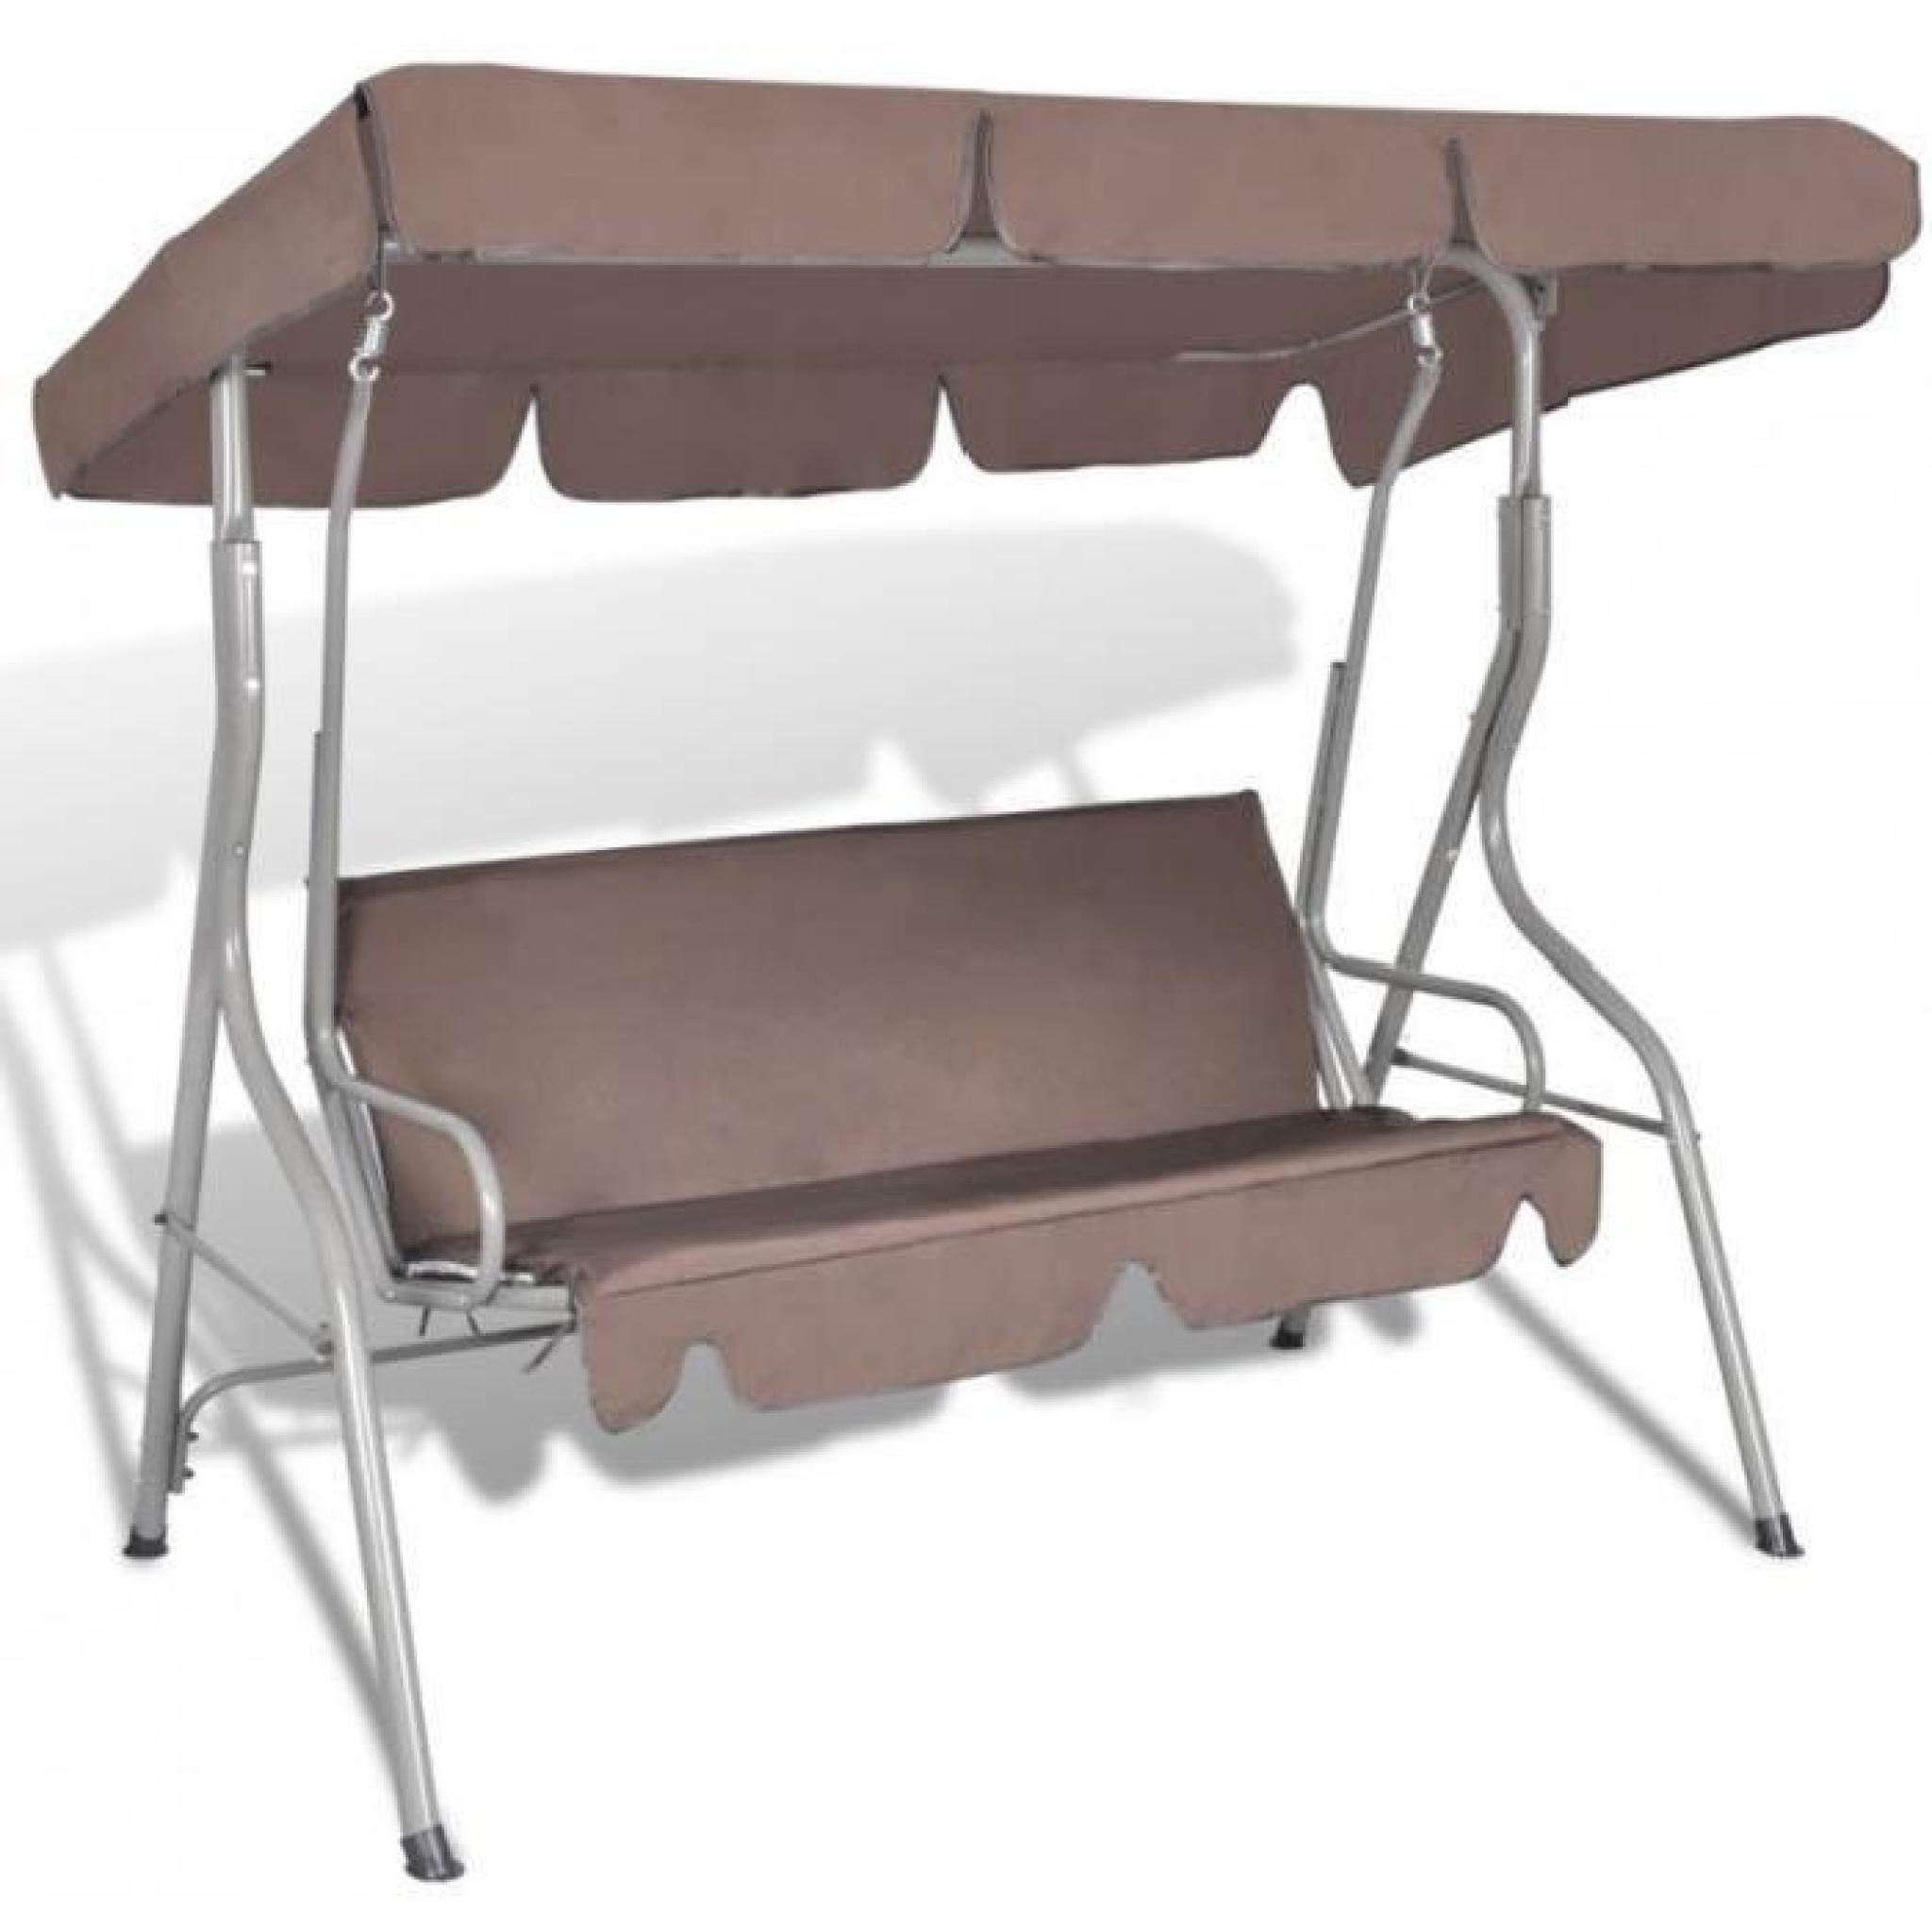 balancelle de jardin avec auvent abri jardin 2202045. Black Bedroom Furniture Sets. Home Design Ideas